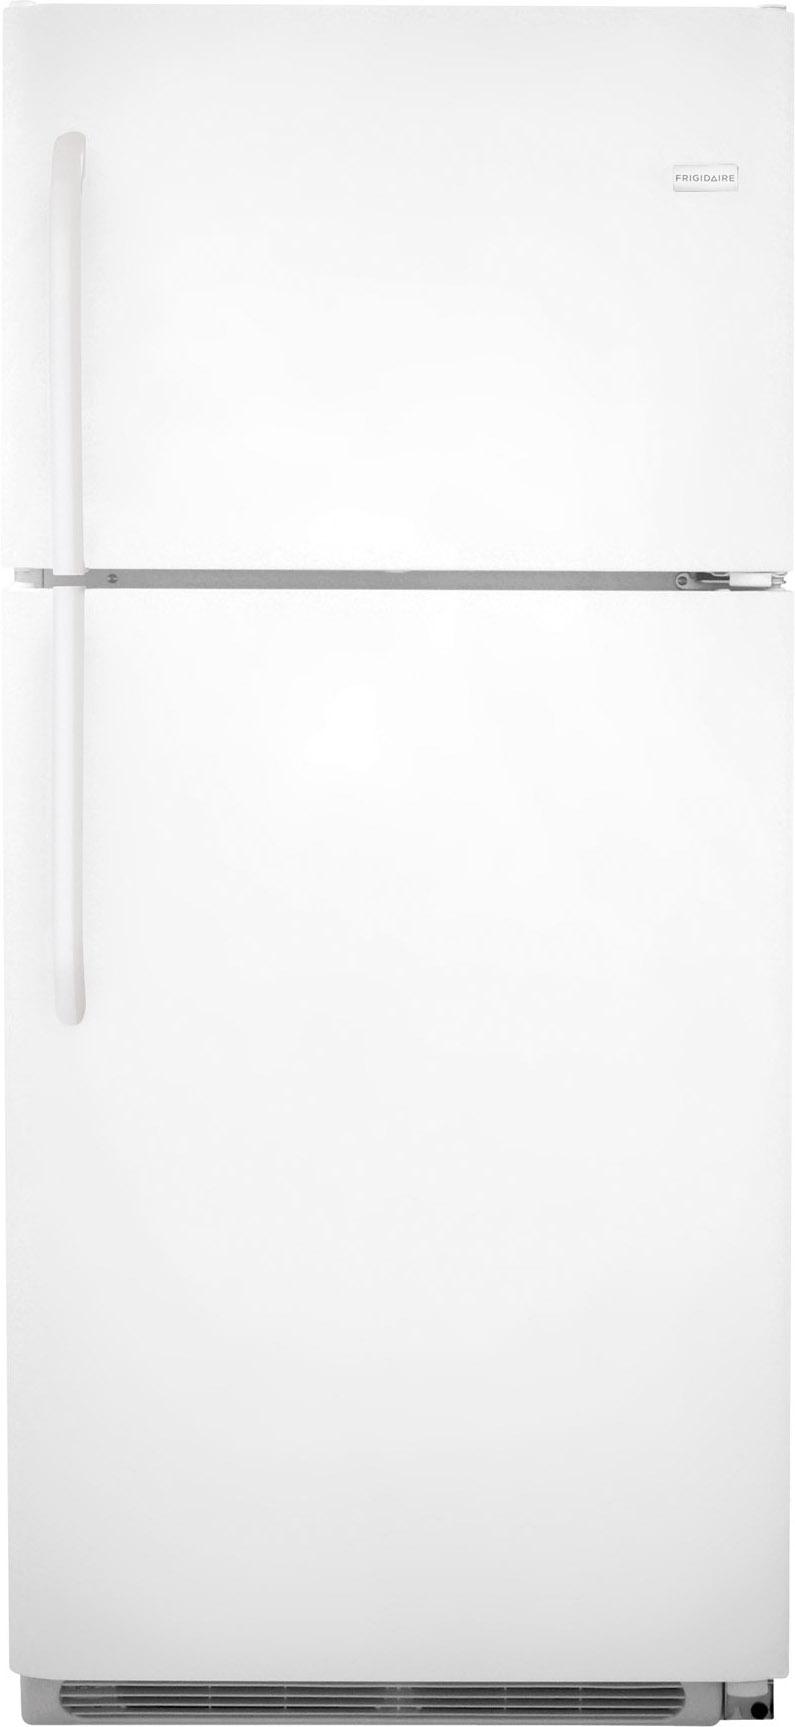 Frigidaire Refrigerator Model FFHT2126LW2 Parts